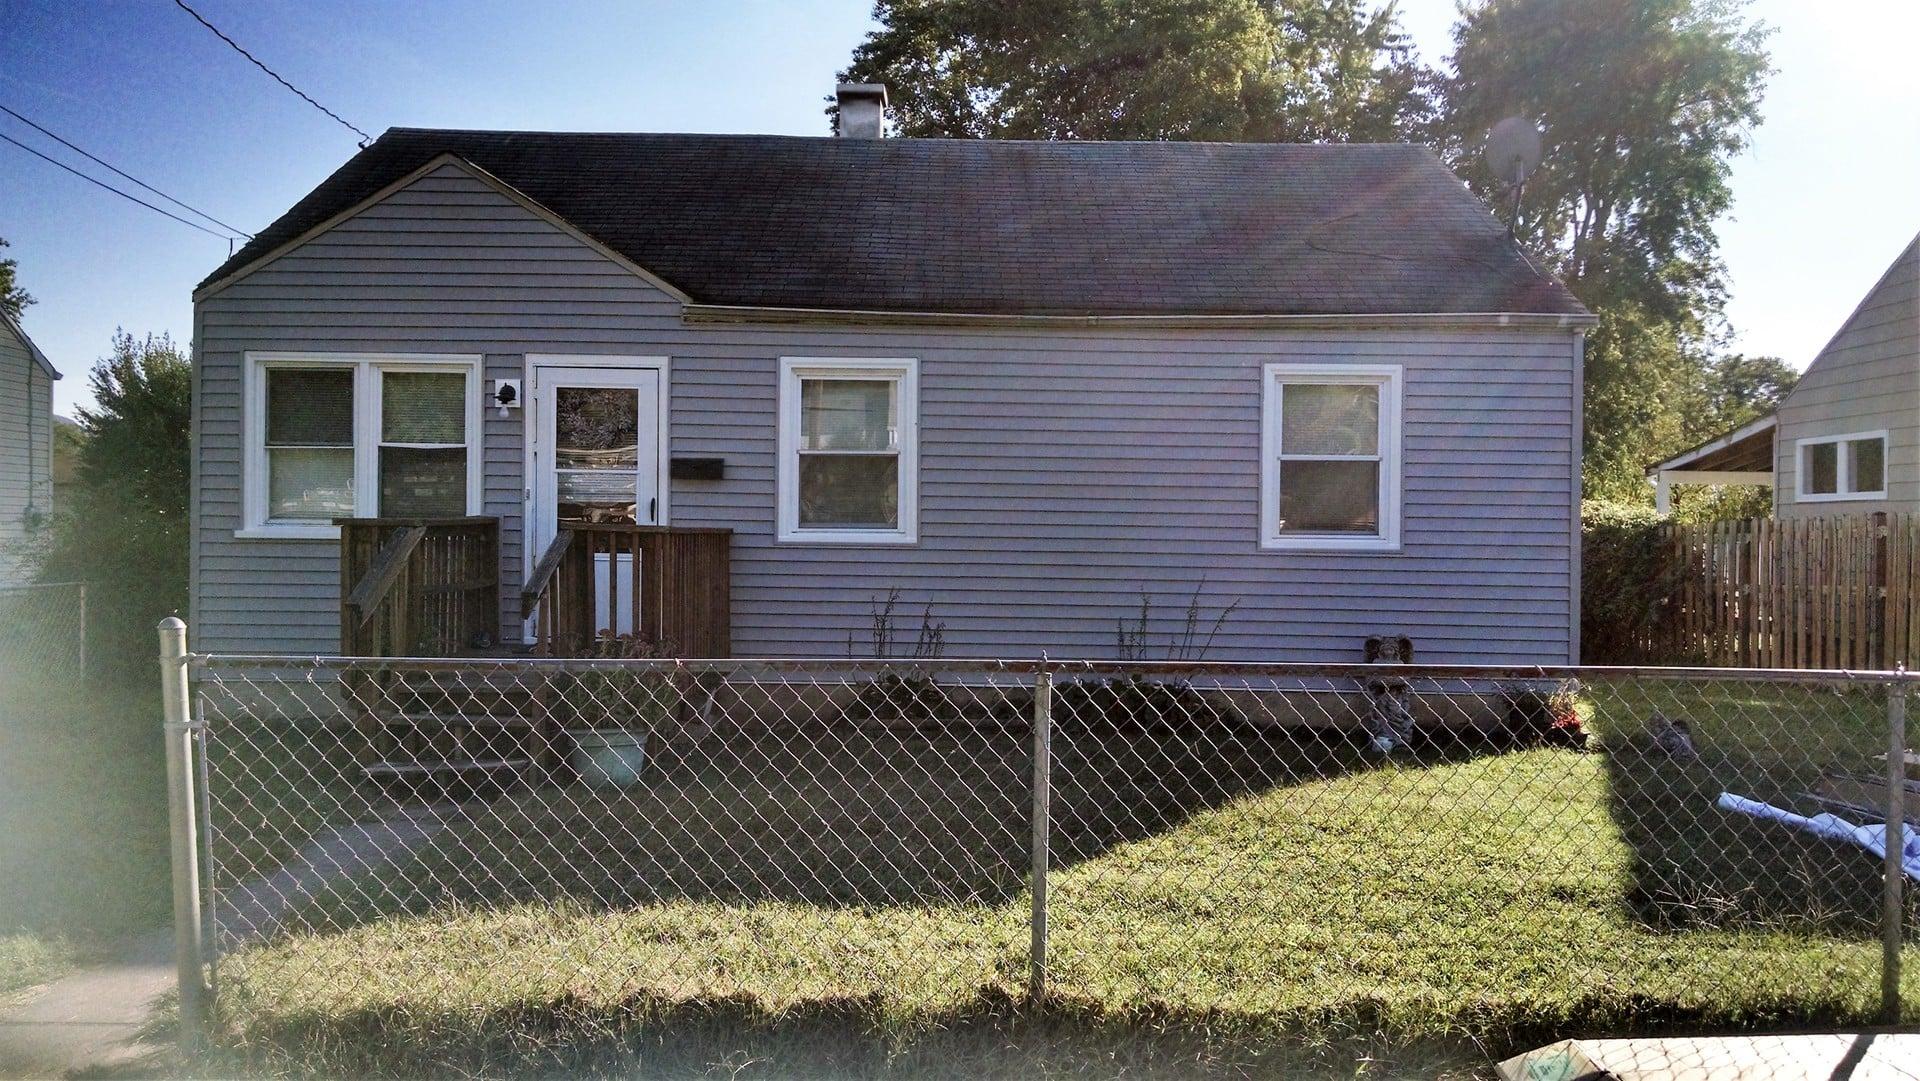 Roof Siding American Dream Restoration Llc